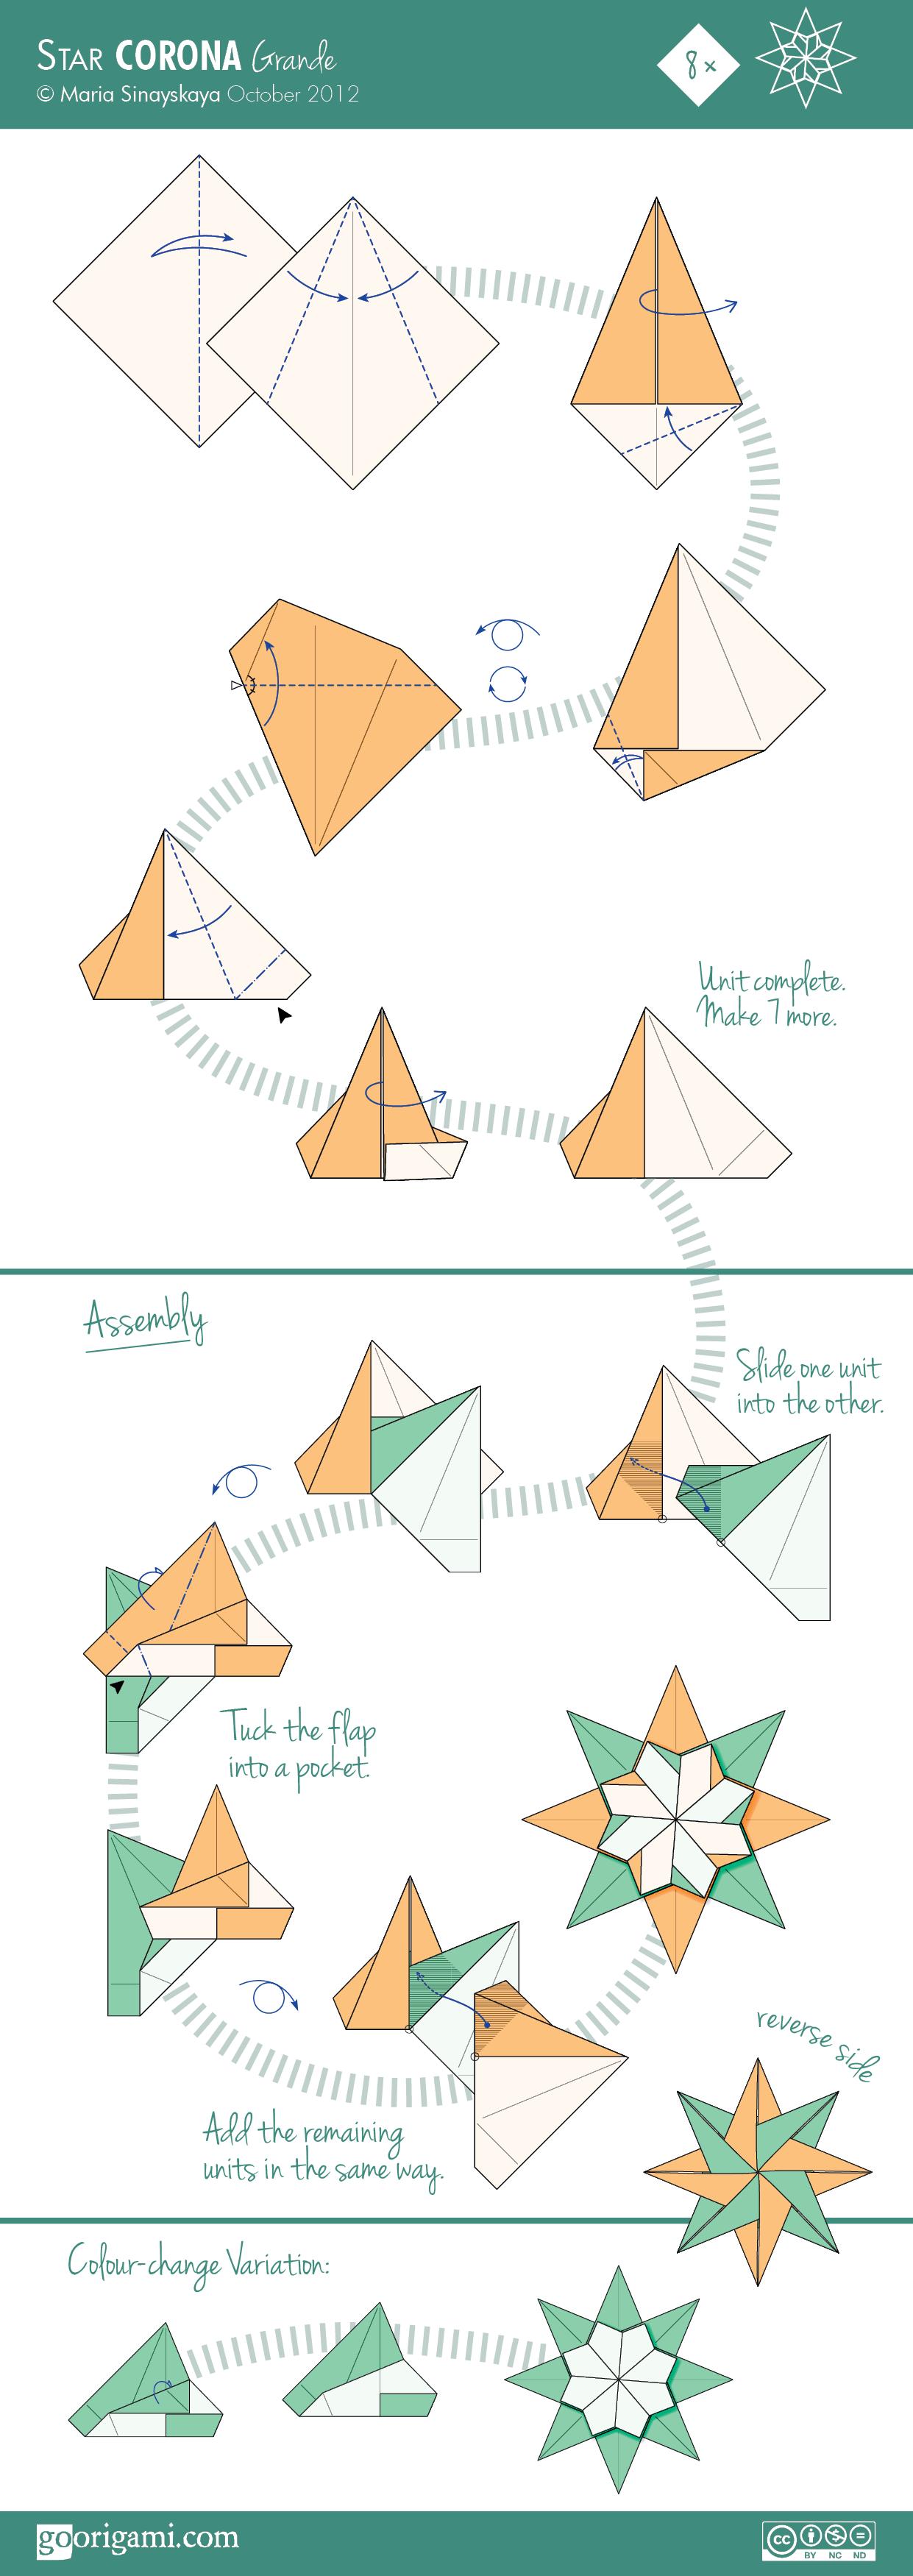 Corona Grande Star by Maria Sinayskaya — Diagram | Go Origami